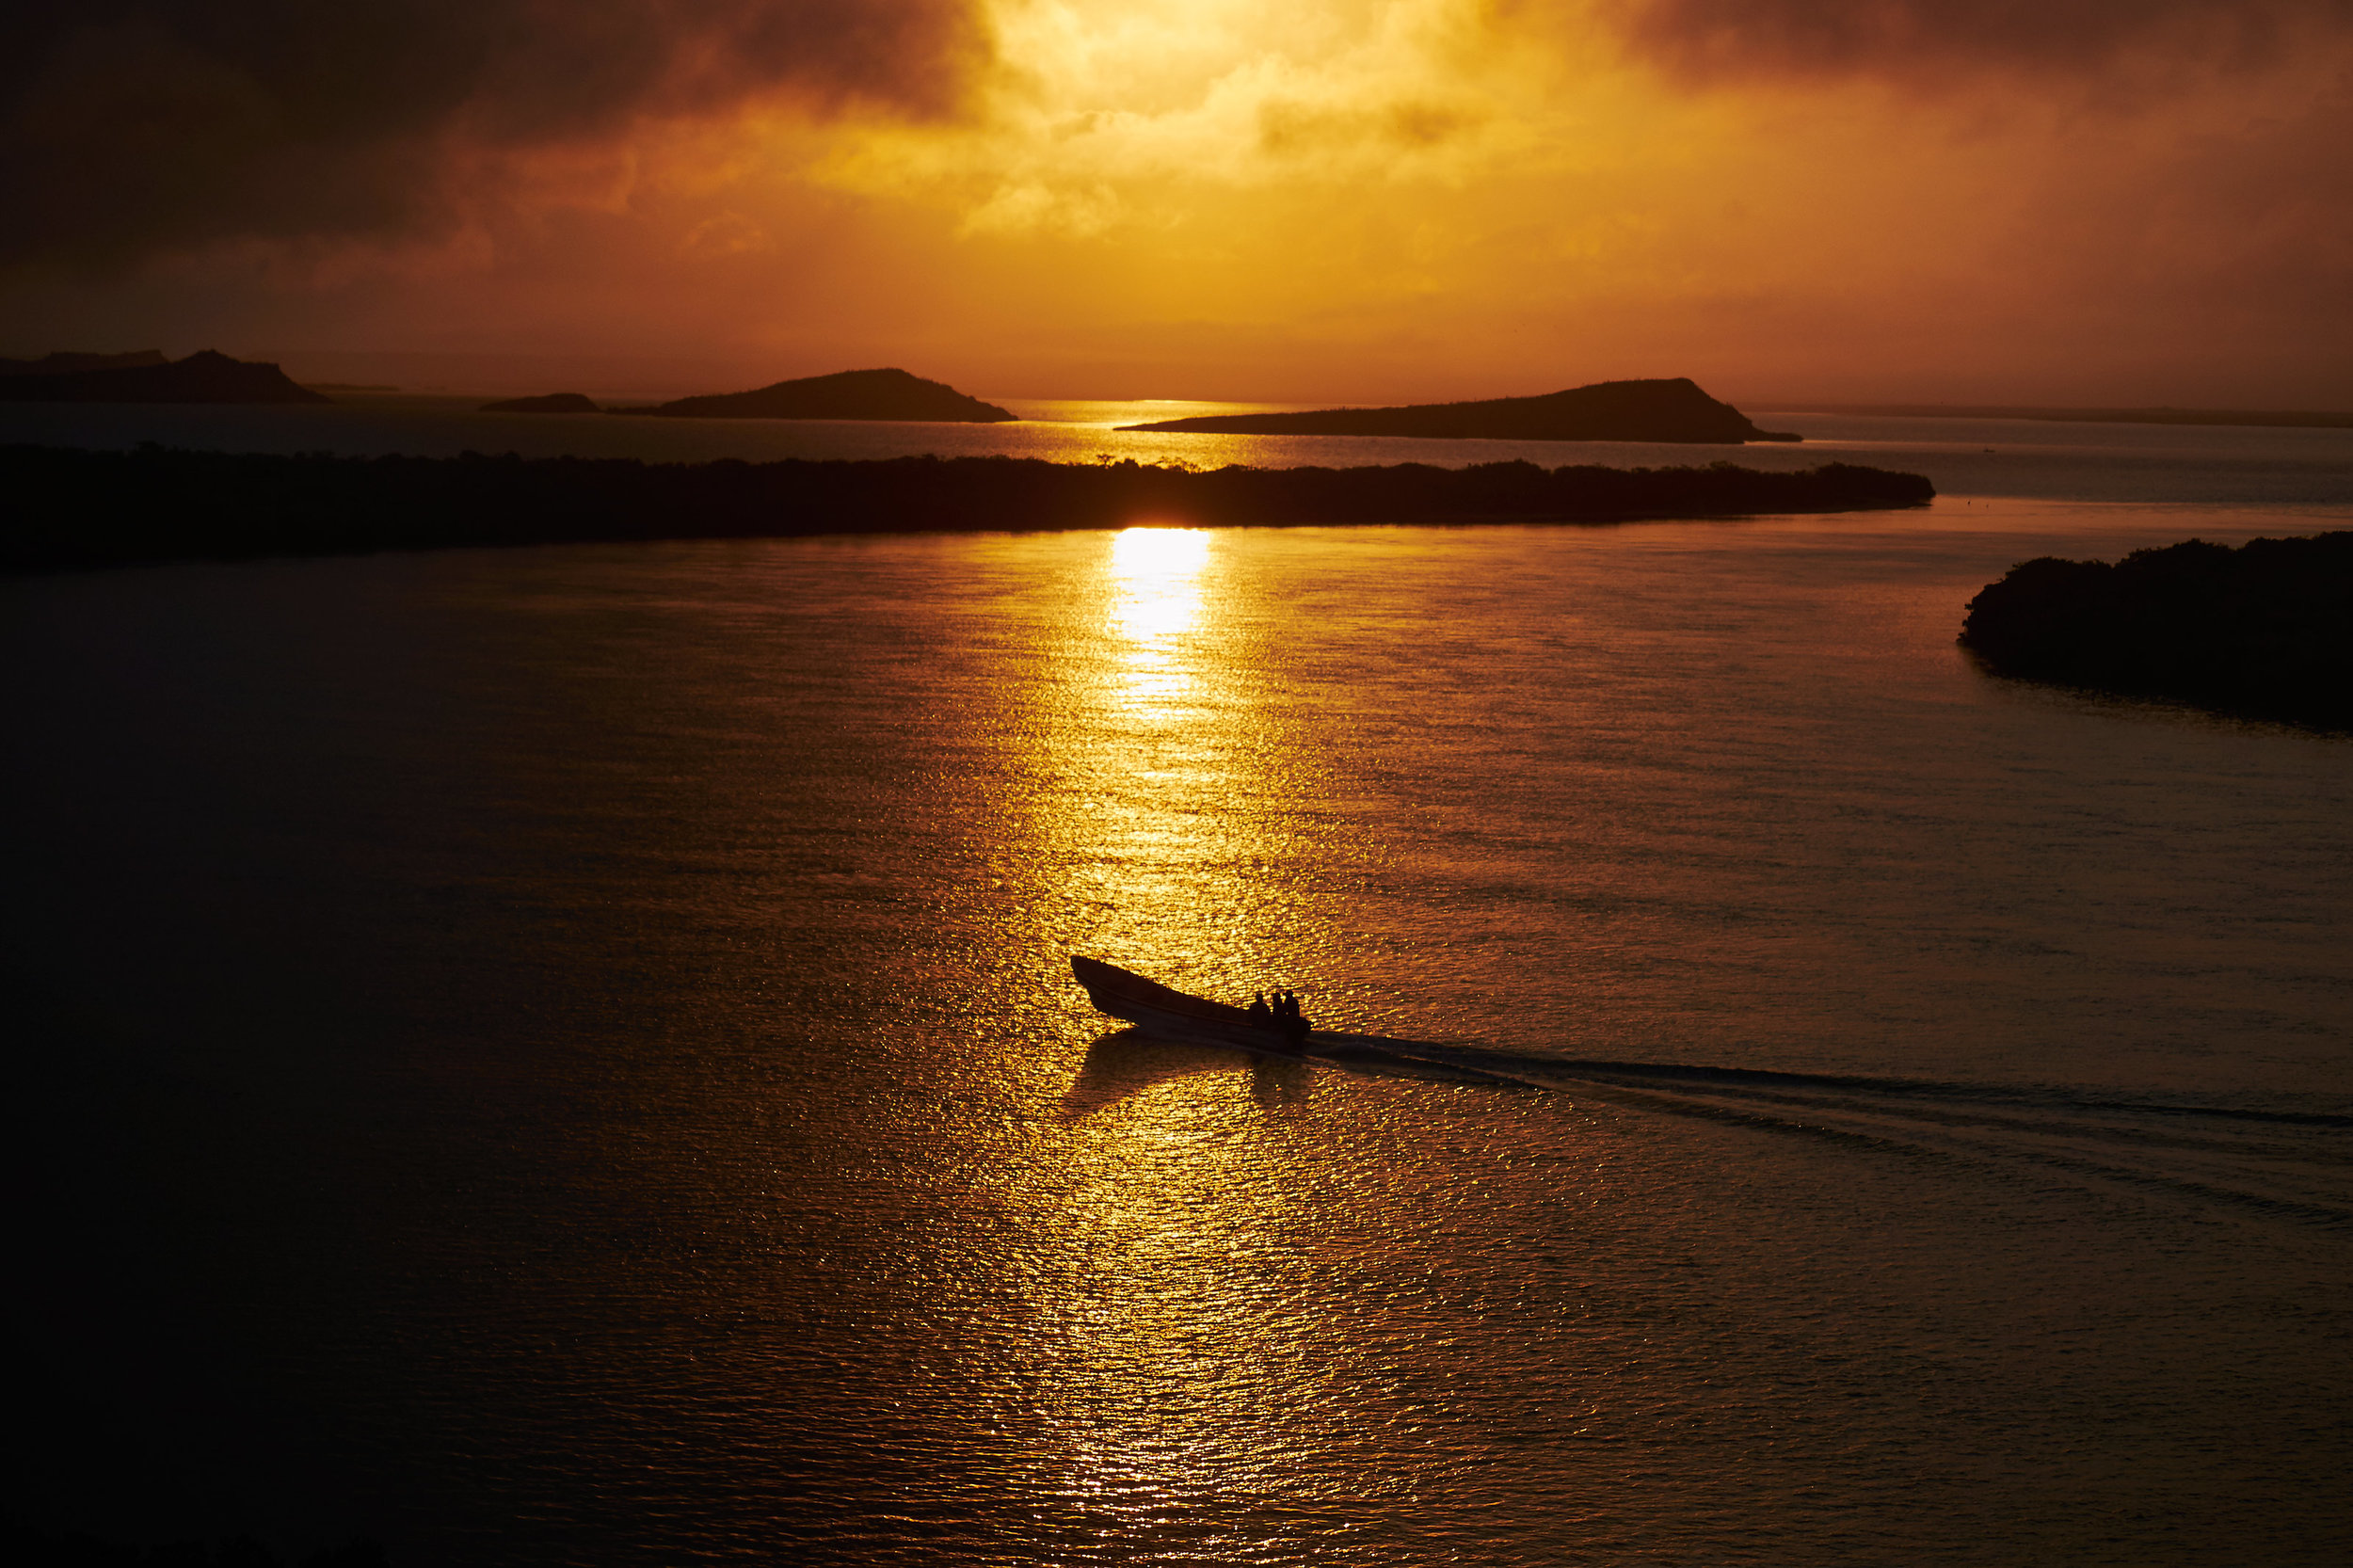 Sunrise over Bahia Hondita